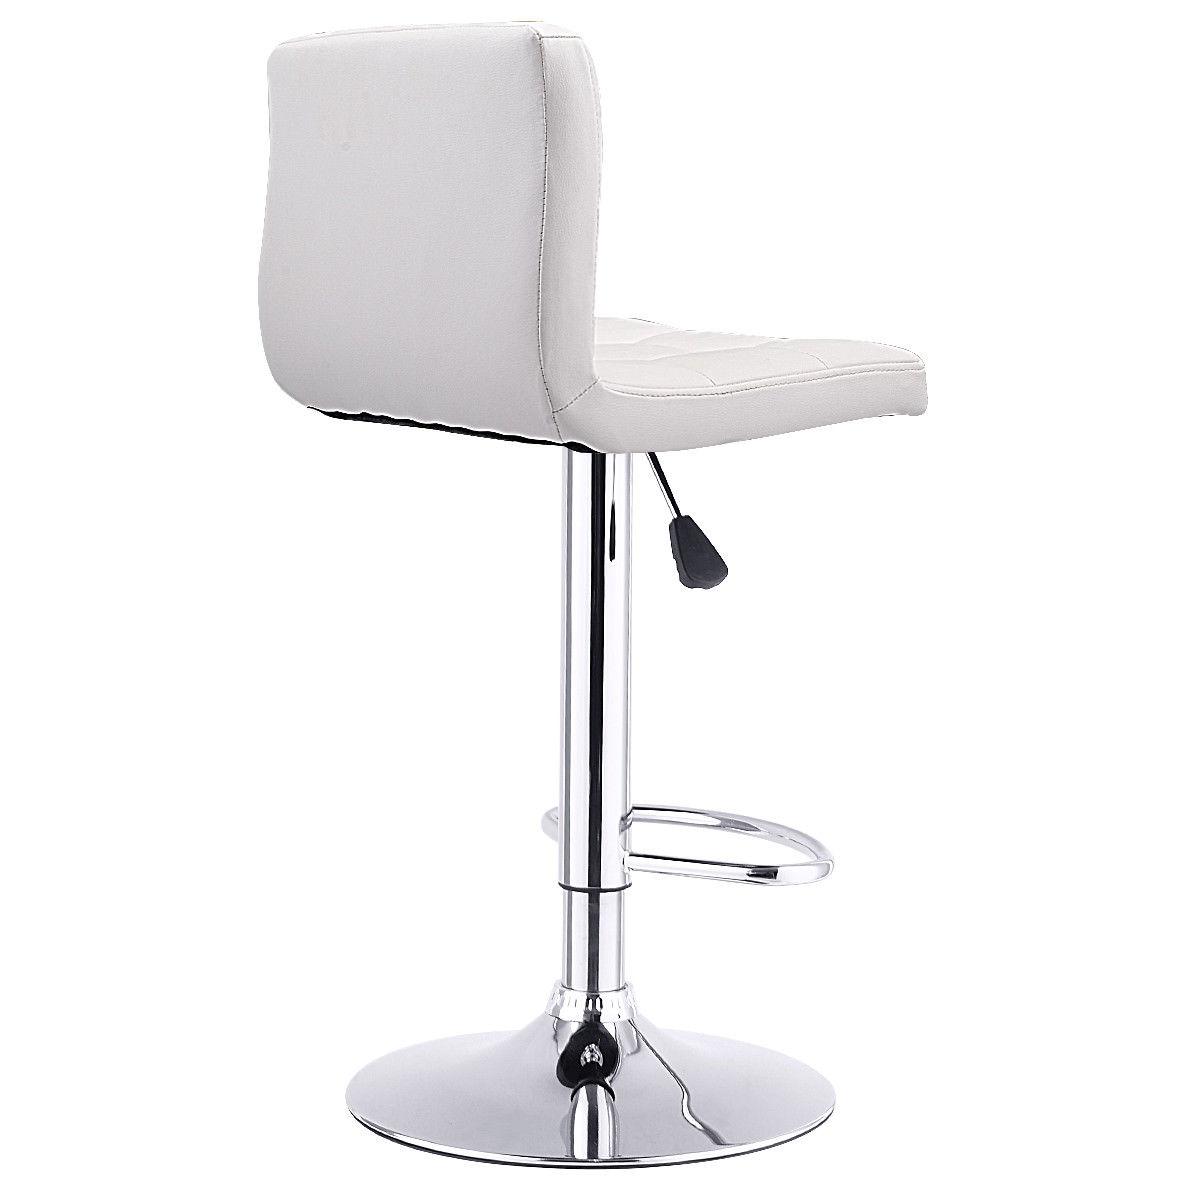 1 PC Bar Stool Swivel Adjustable PU Leather Barstools Bistro Pub Chair